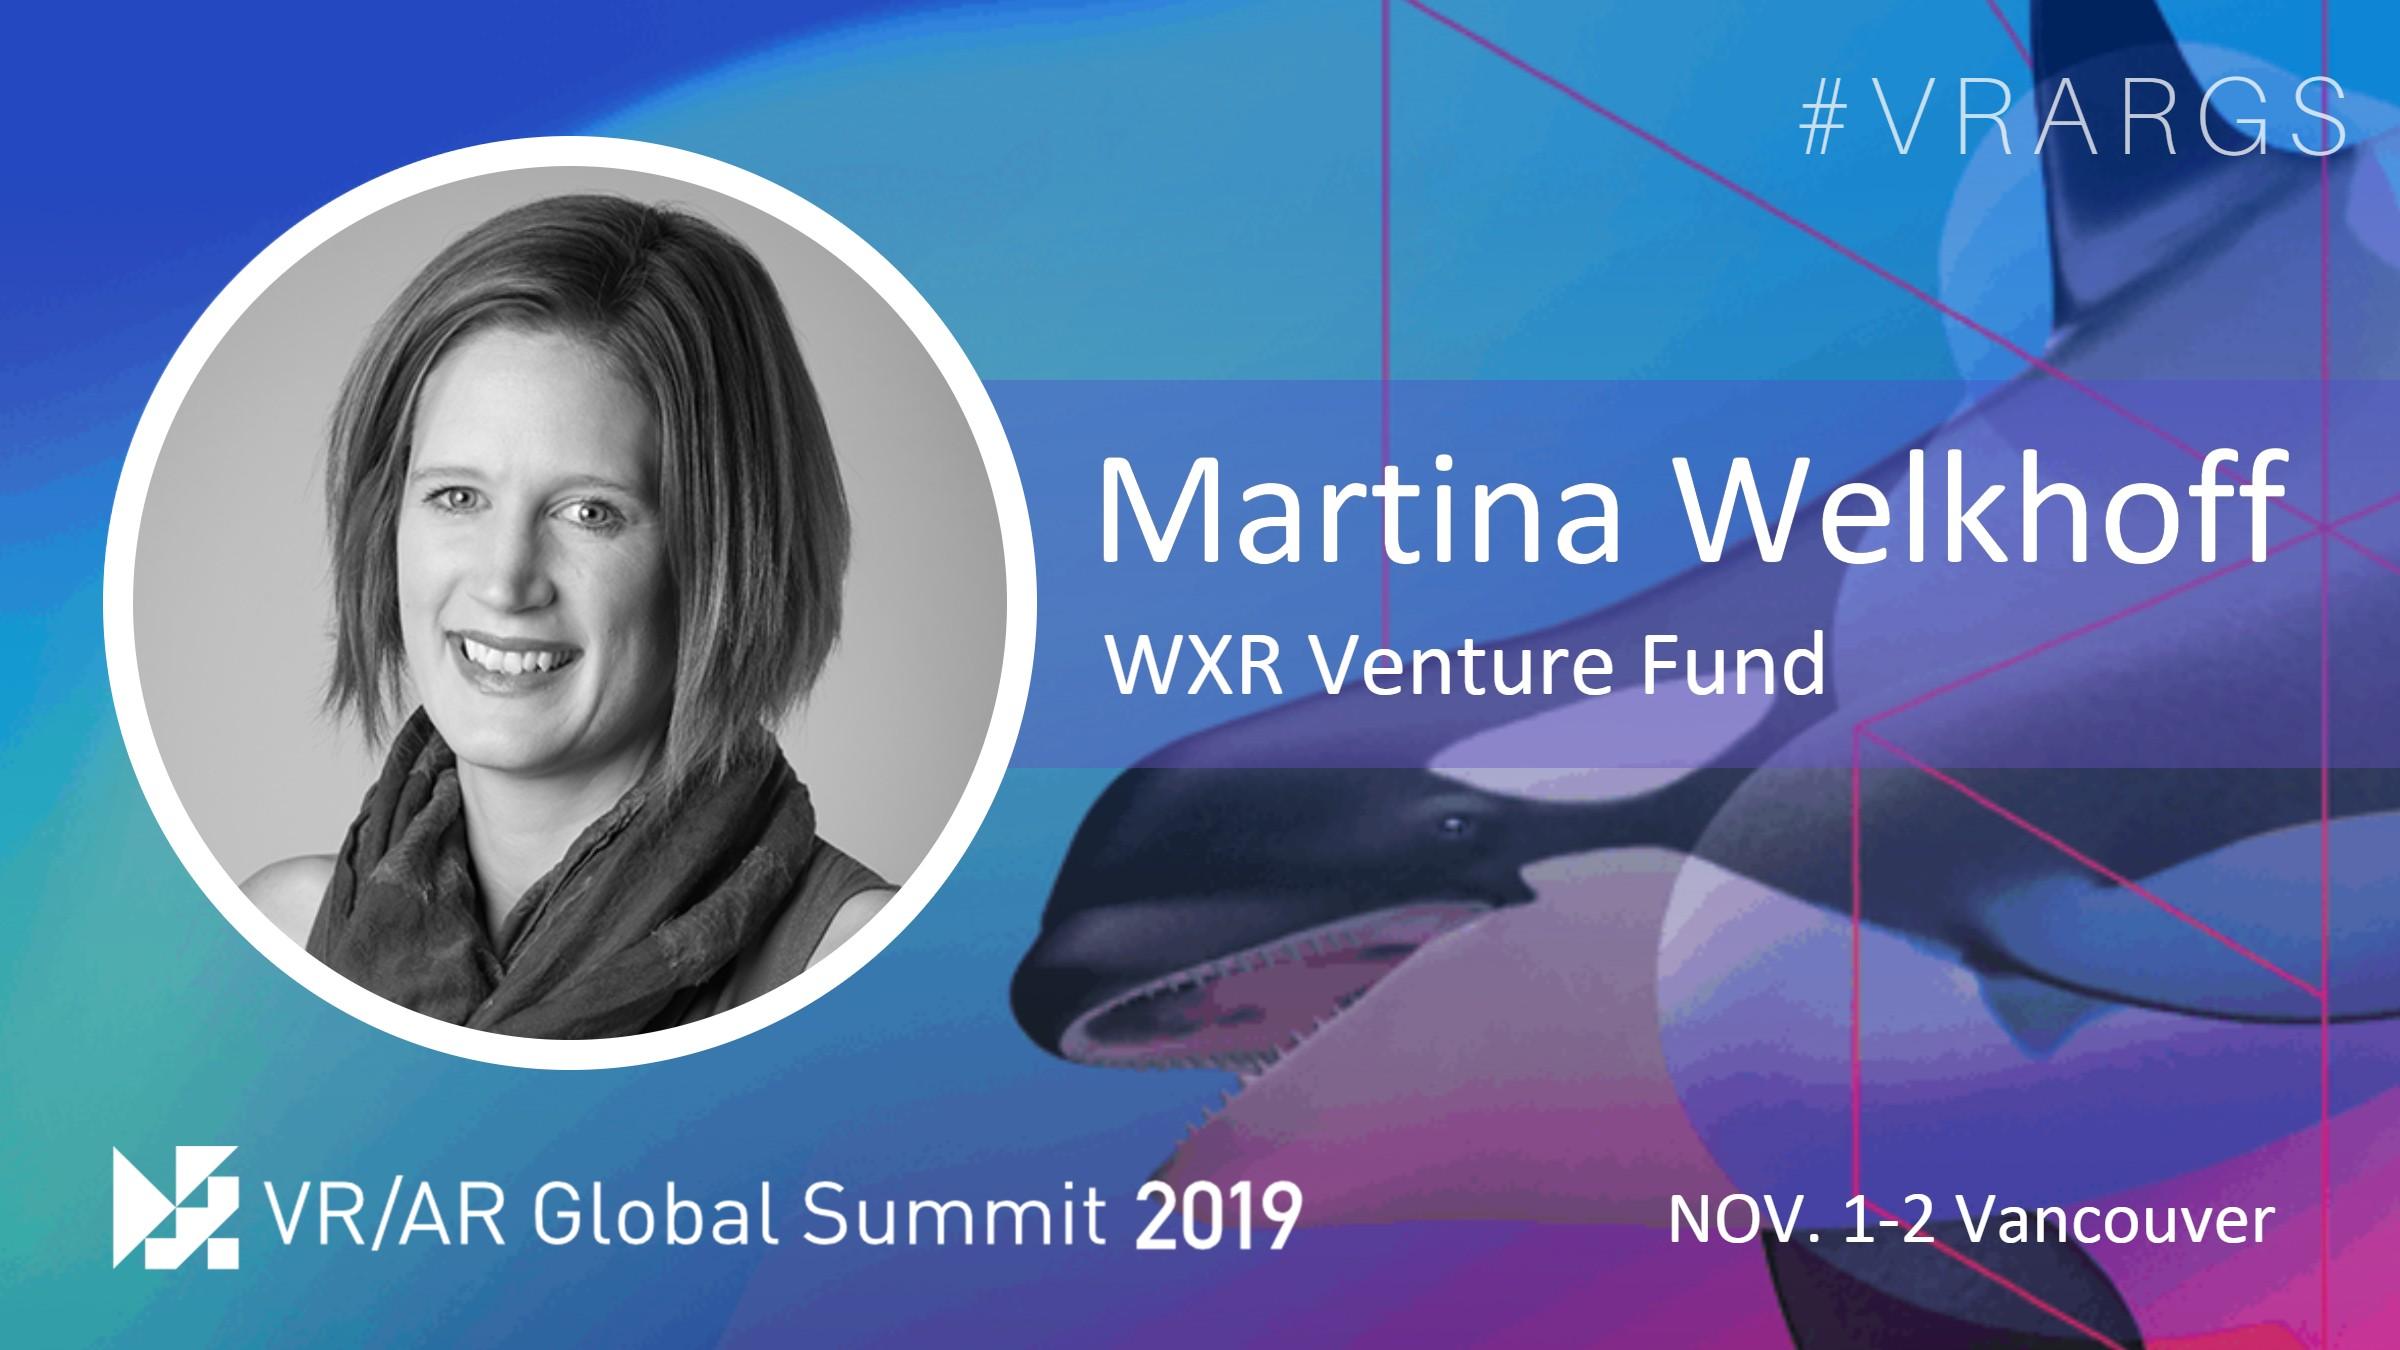 HighRes-Martina-Welkhoff-WXR-Venture-Fund-VRARGS-VRAR-Global-Summit-Spatial-Computing-Vancouver-Women-In-XR.jpg